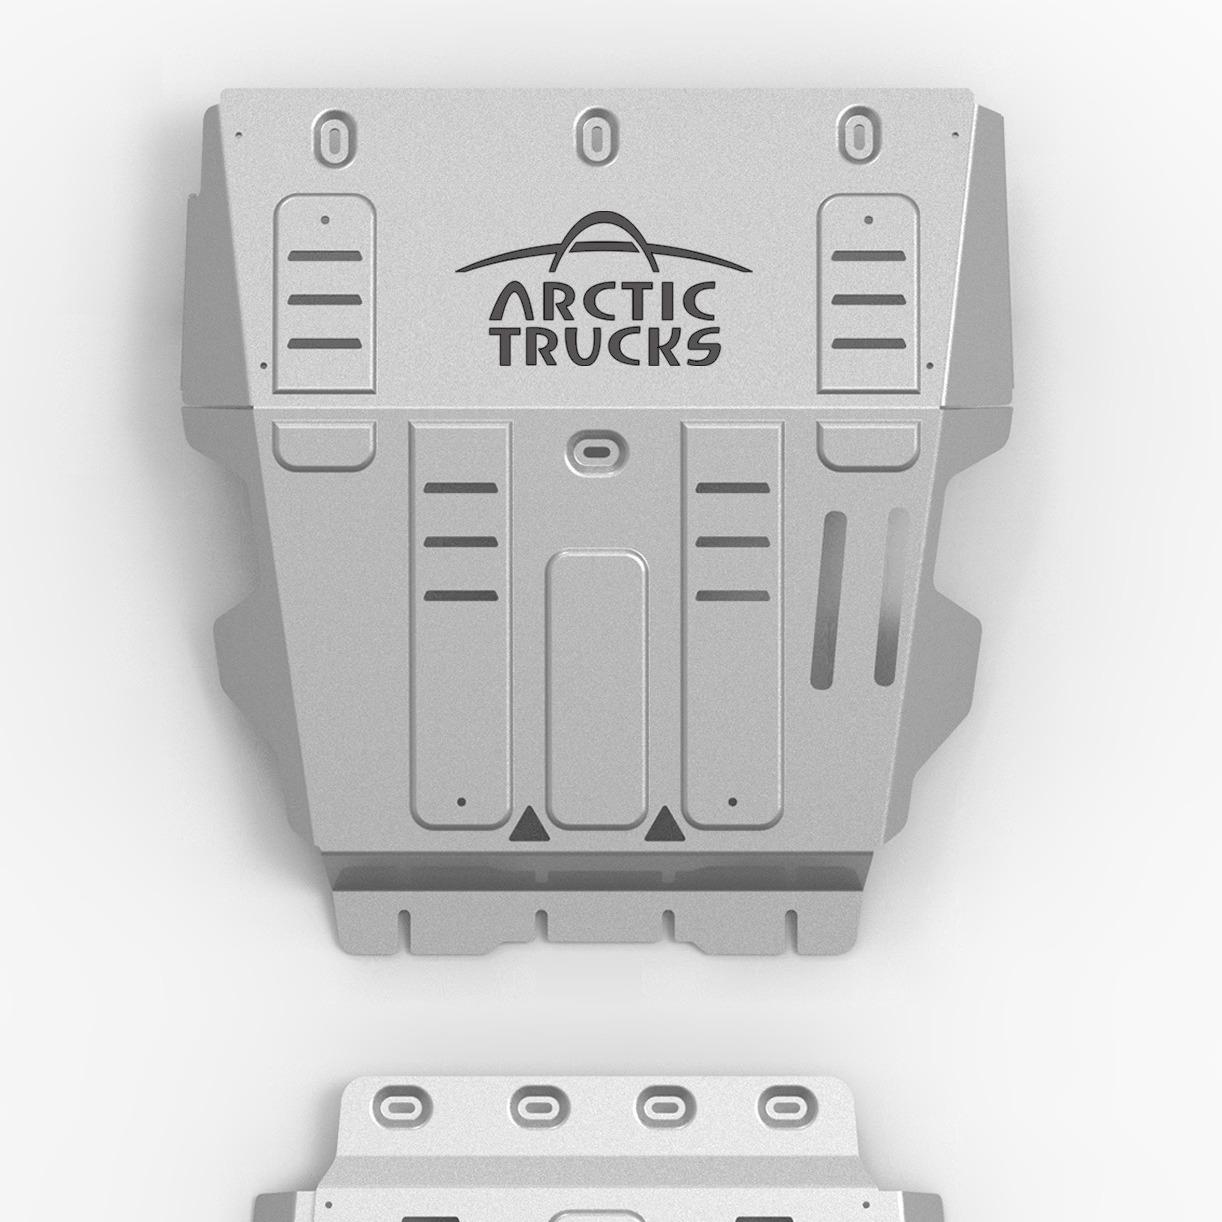 Rival skliplate med Arctic Trucks logo (del1)